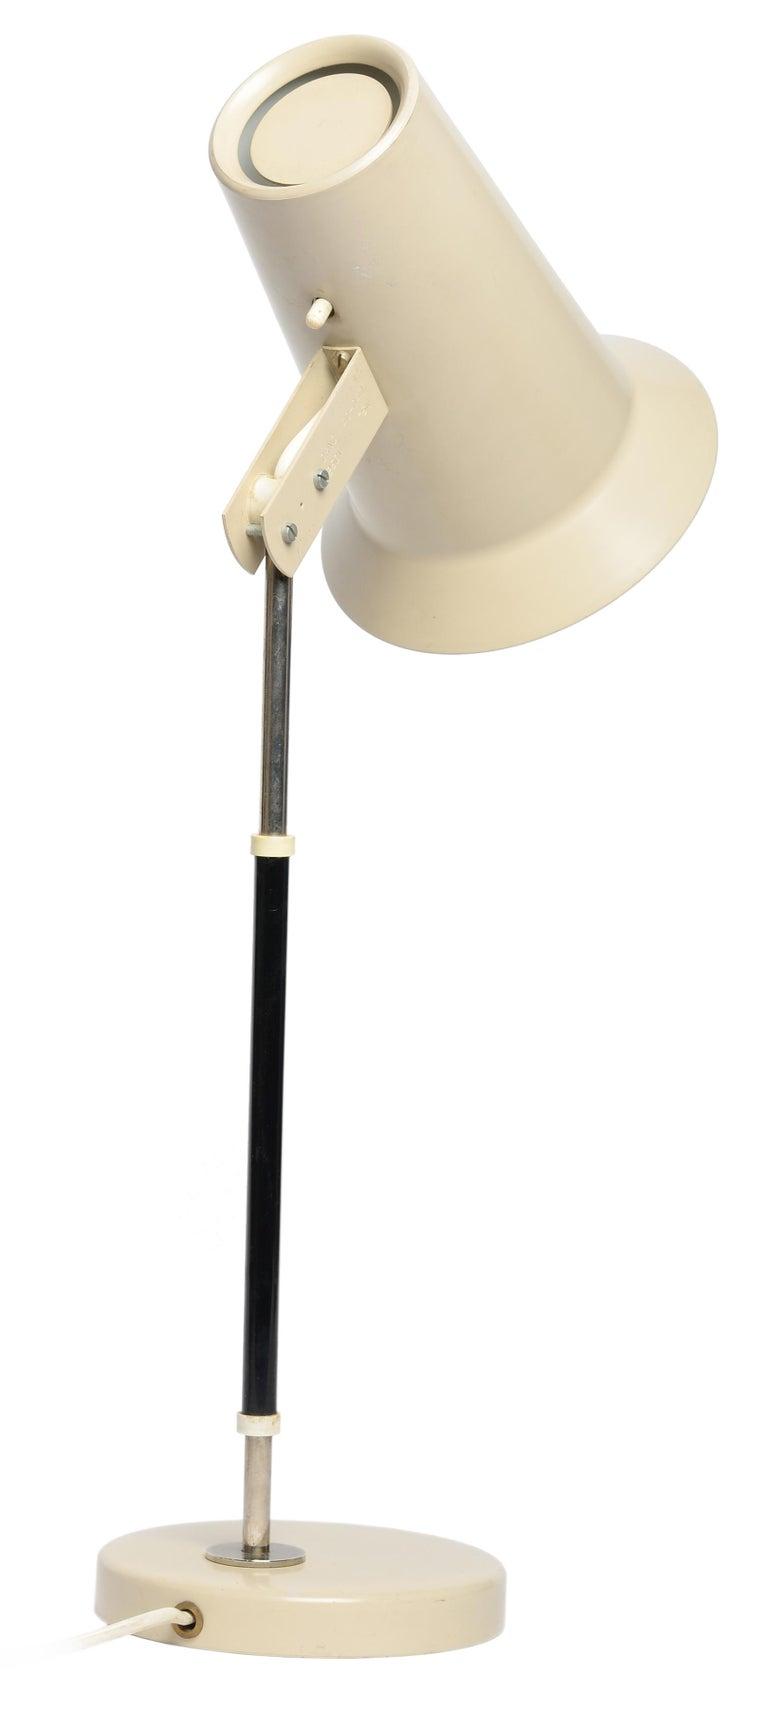 Mid-Century Modern Yki Nummi Table Lamp for Orno Finland For Sale